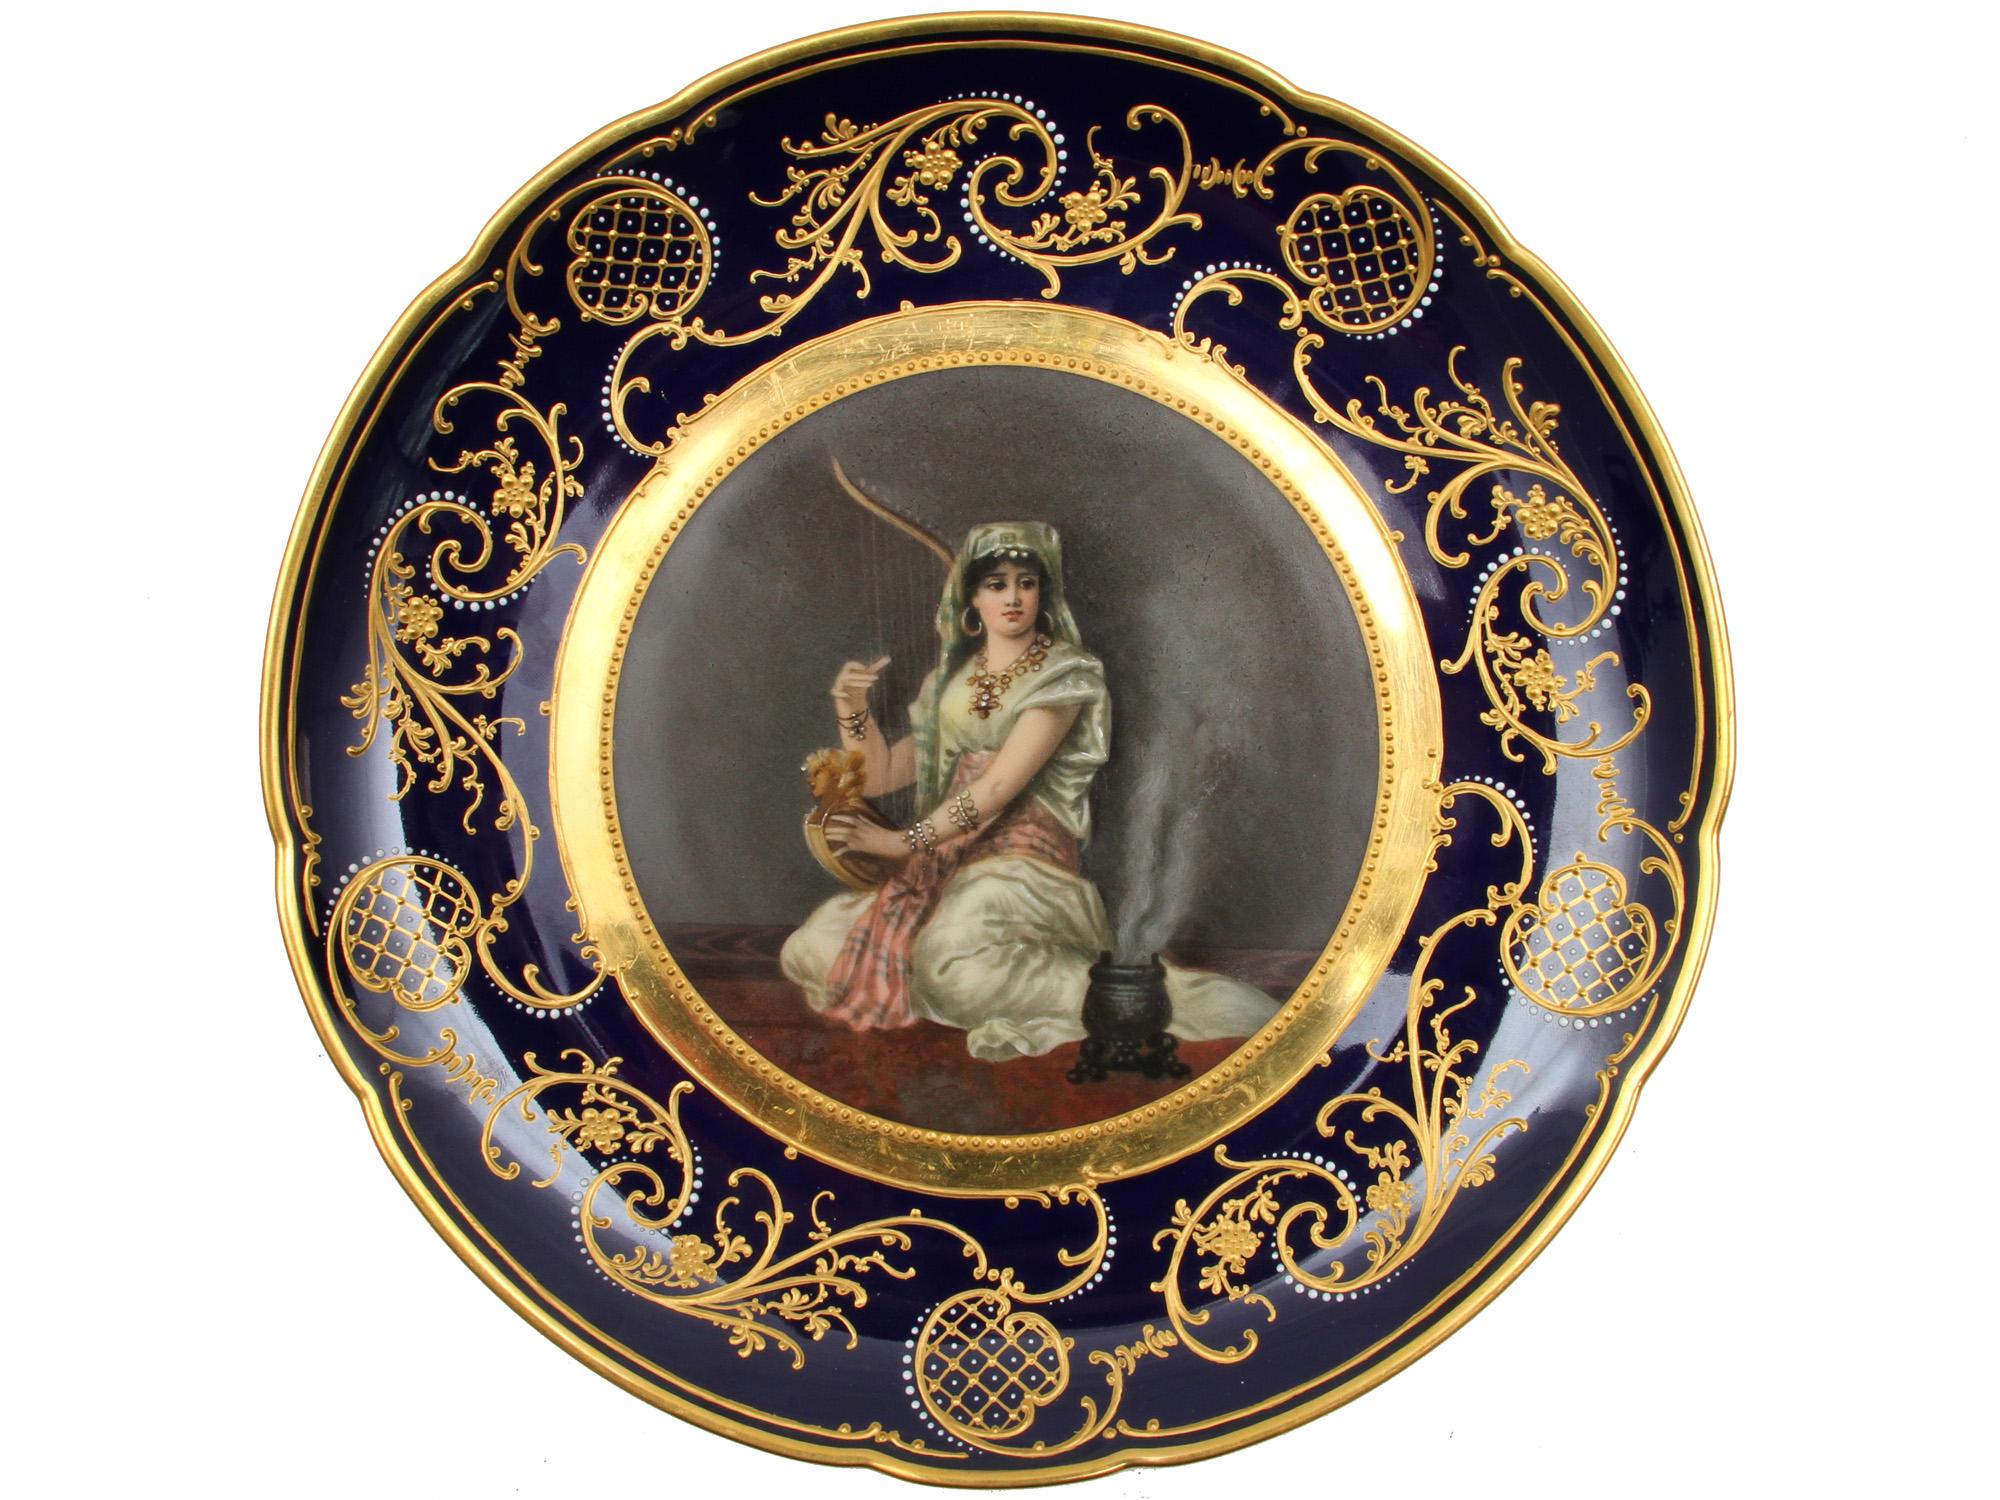 Helios Auctions : ROYAL VIENNA HAREM EASTERN GIRL PORTRAIT